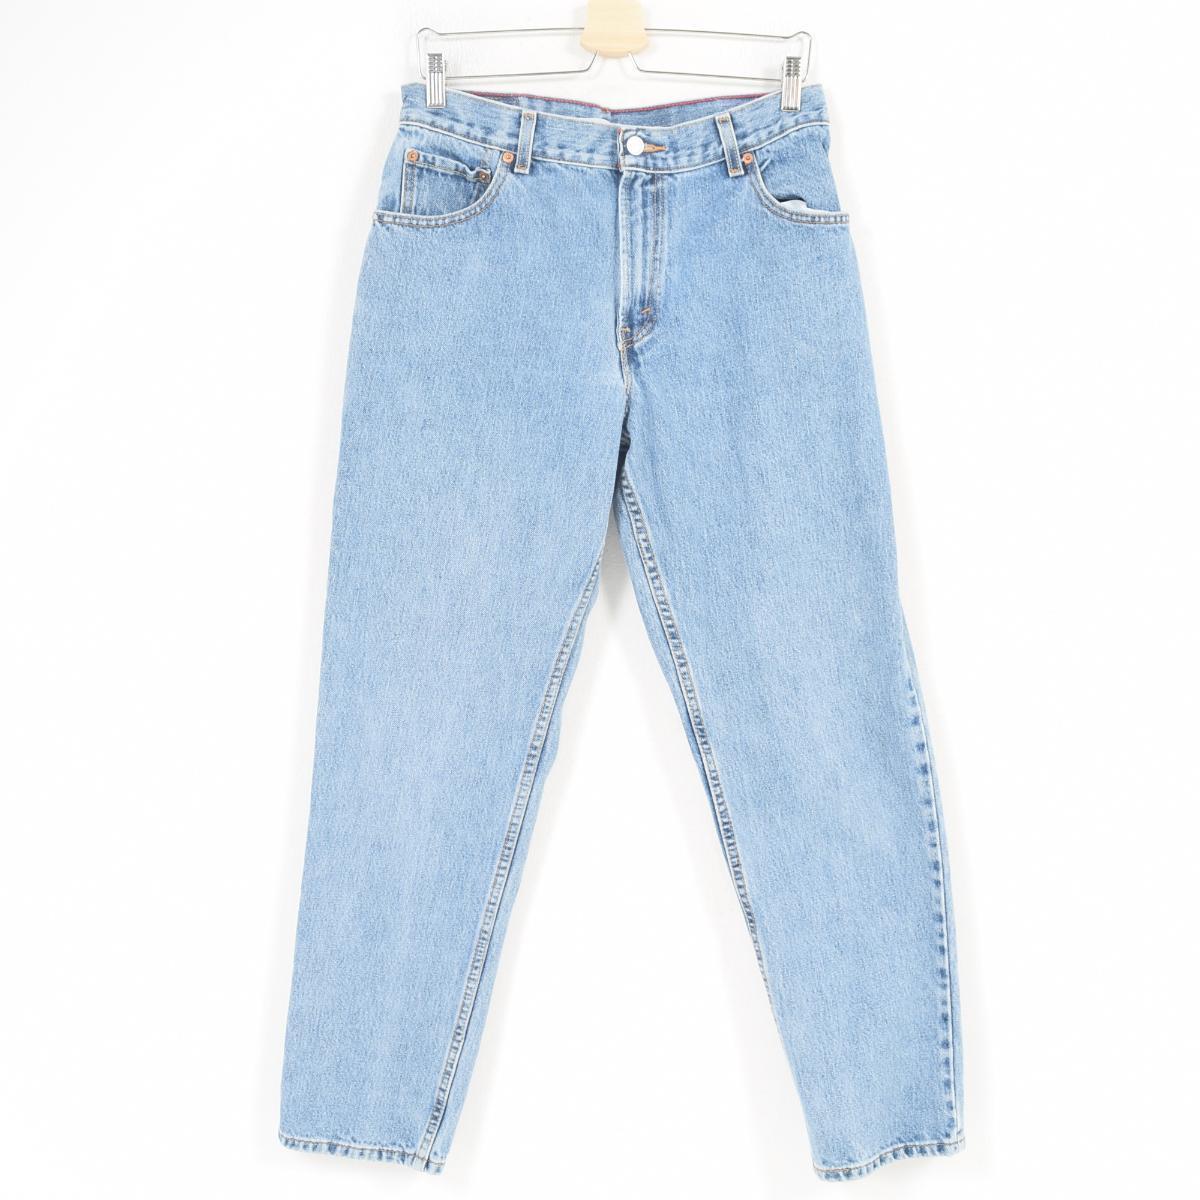 583241913046a Levis Levi s 550 RELAXED FIT TAPERED LEG jeans denim underwear men w32   waq5054